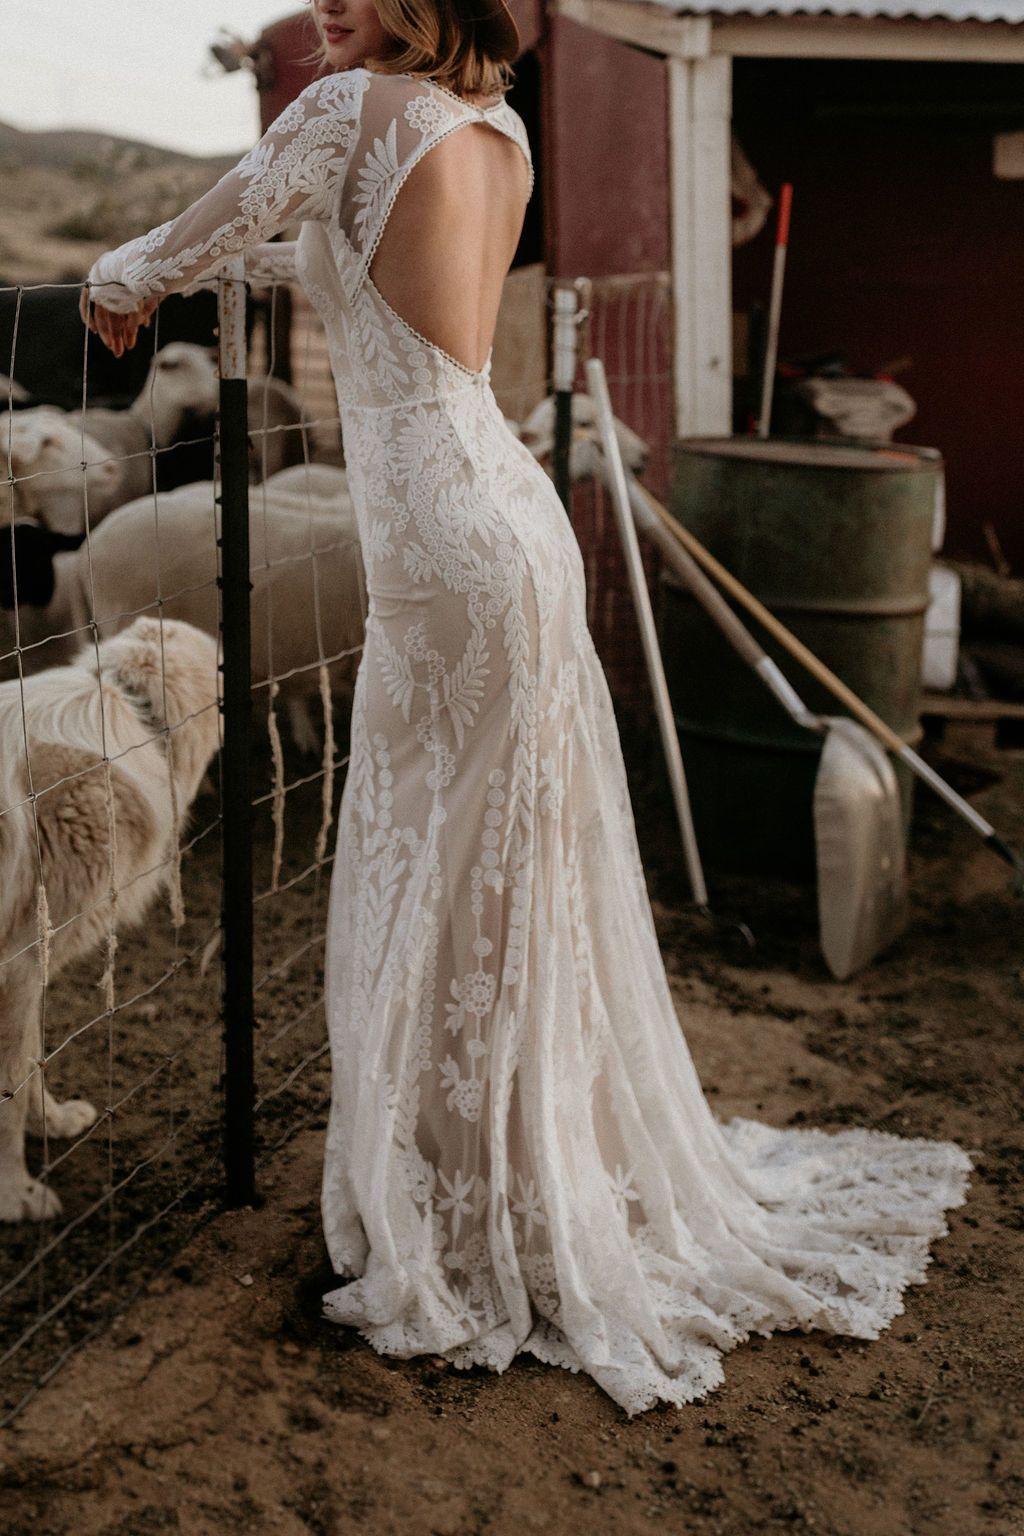 Willow Bohemian Lace Wedding Dress In 2020 Bohemian Wedding Dress Lace Wedding Dresses Lace Wedding Dresses